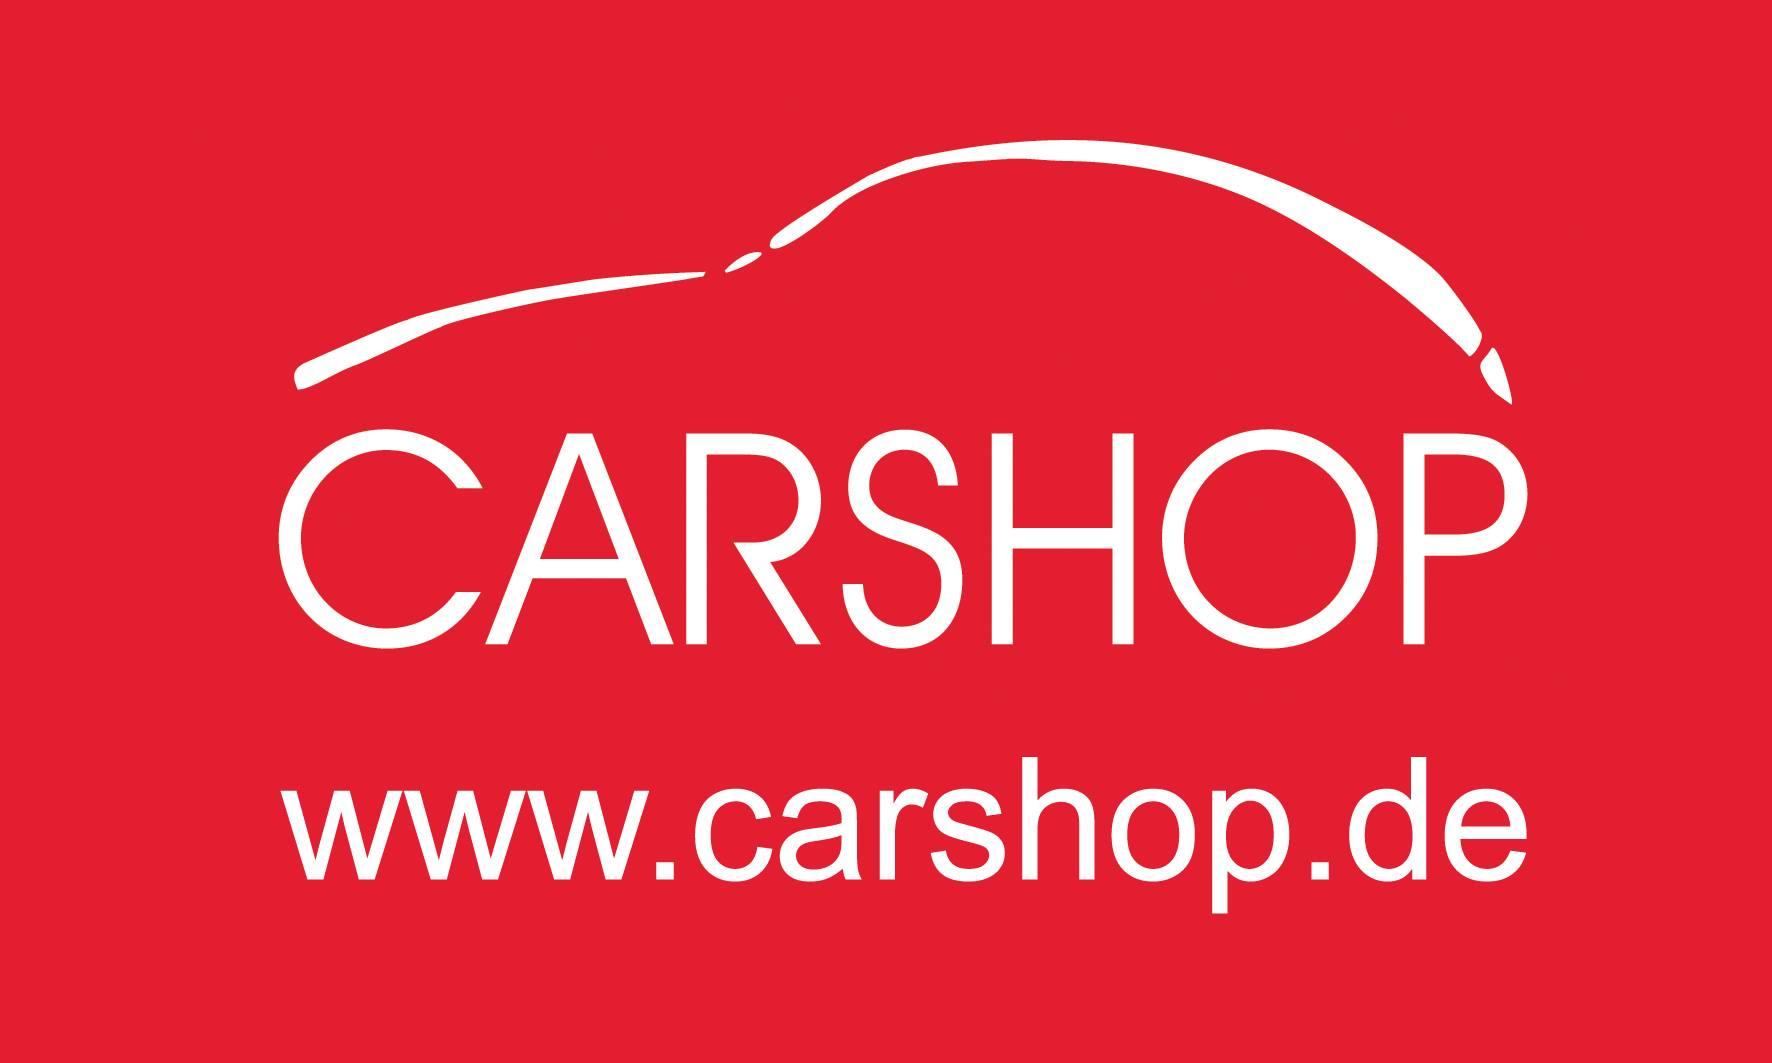 Carshop GmbH